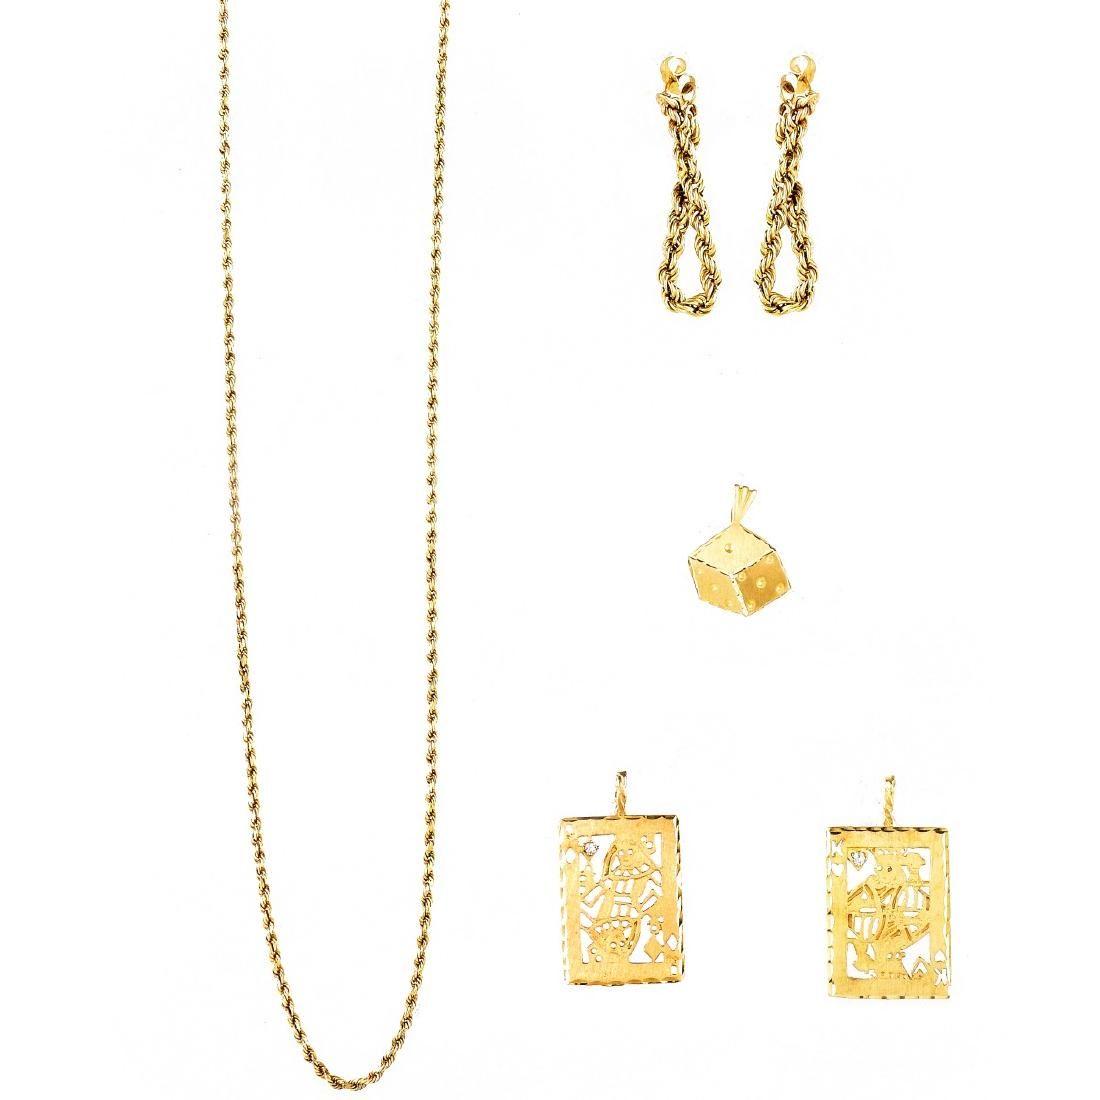 Miscellaneous 14K Gold Lot